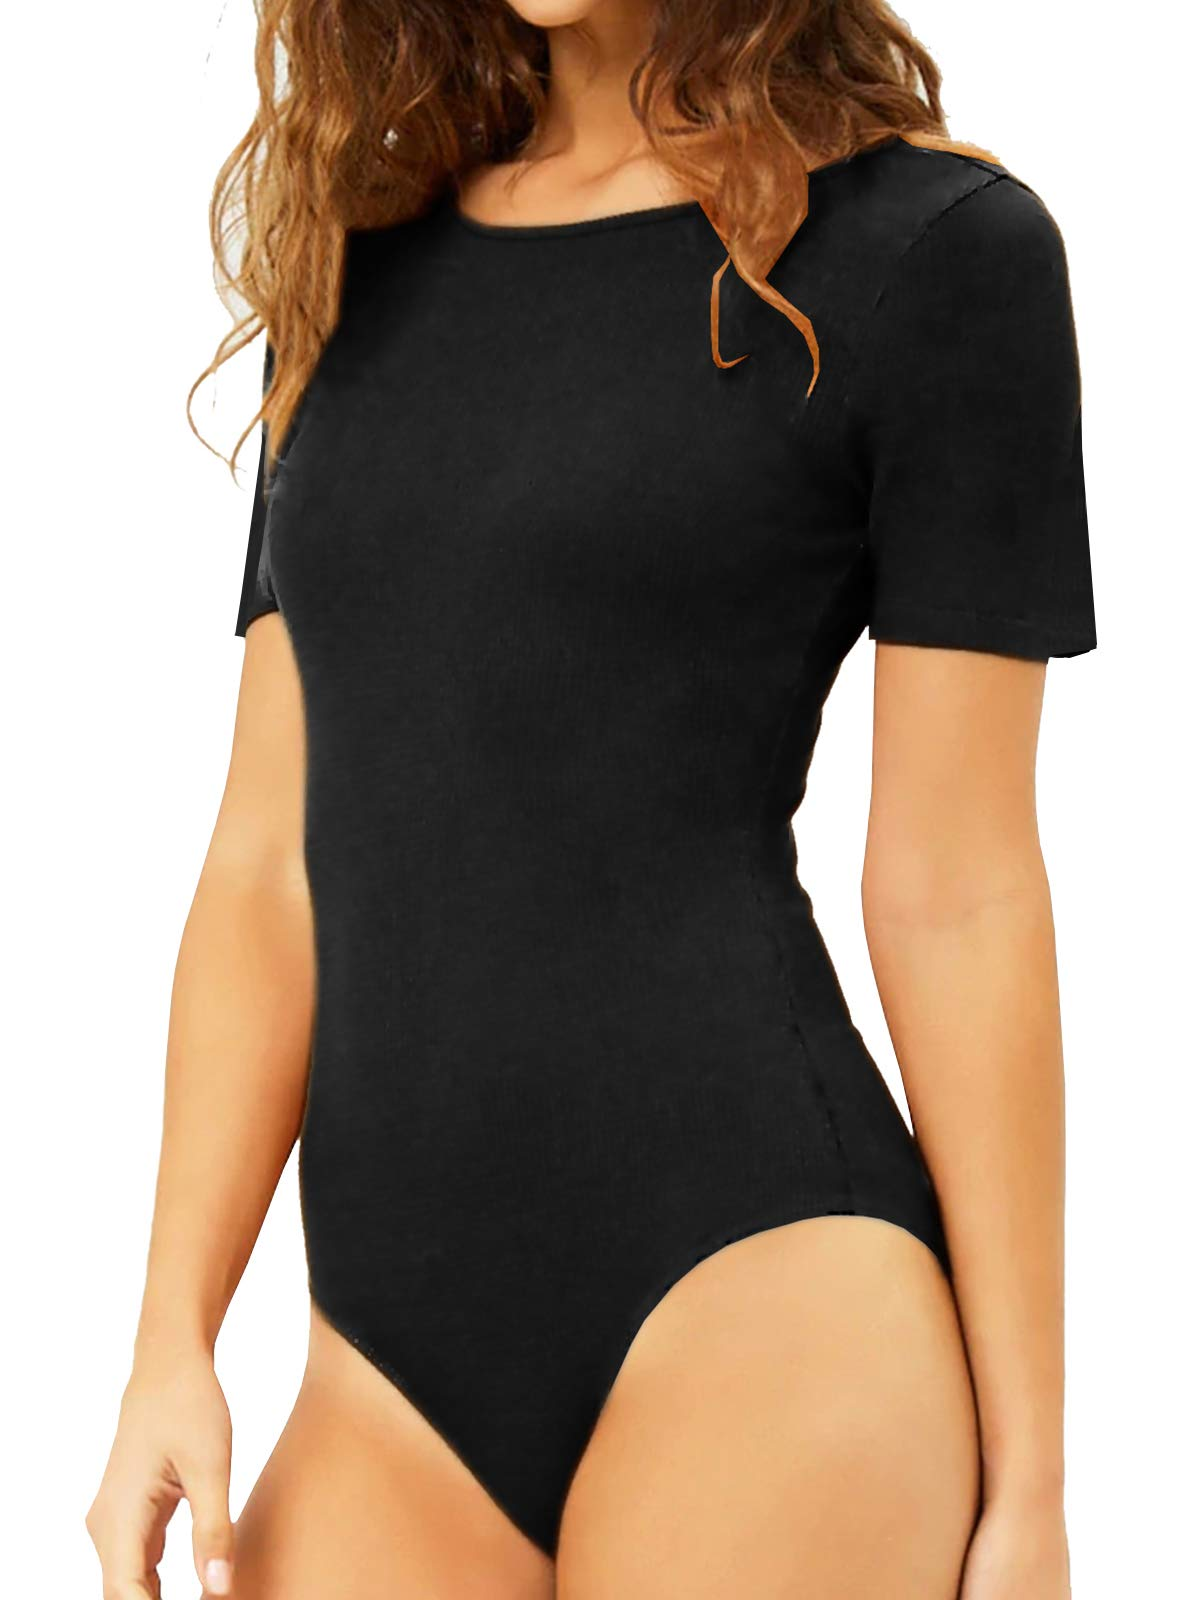 Mangdiup Womens Round Collar Short Sleeve Elastic Bodysuits Jumpsuits Black Xl